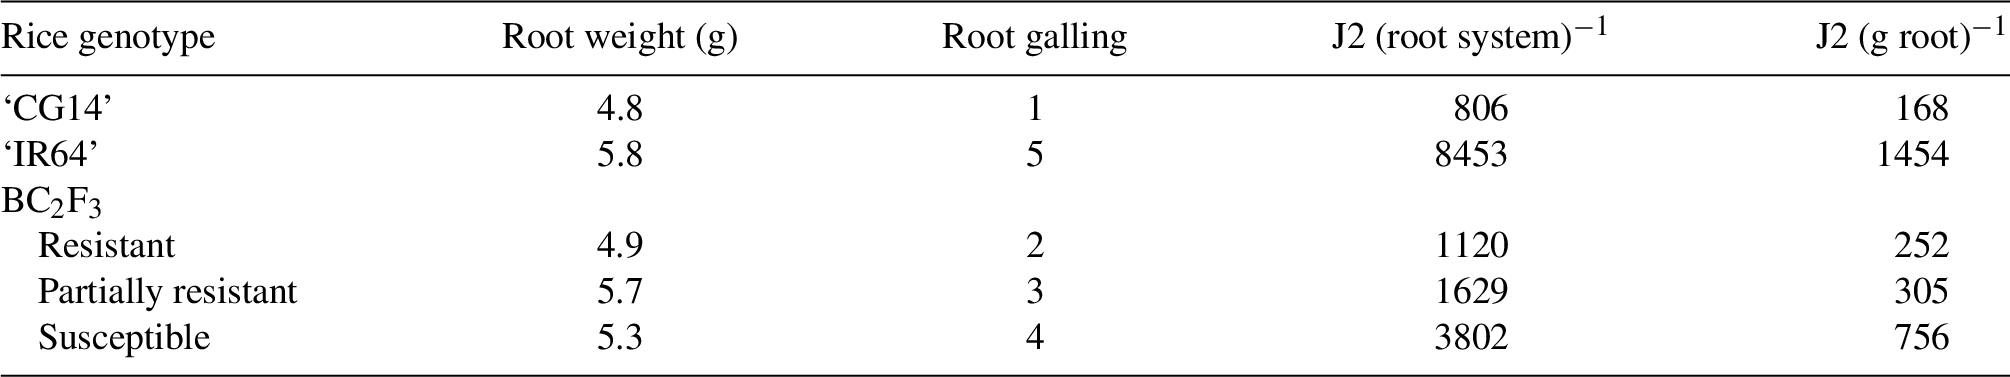 Mapping quantitative trait loci of Meloidogyne graminicola